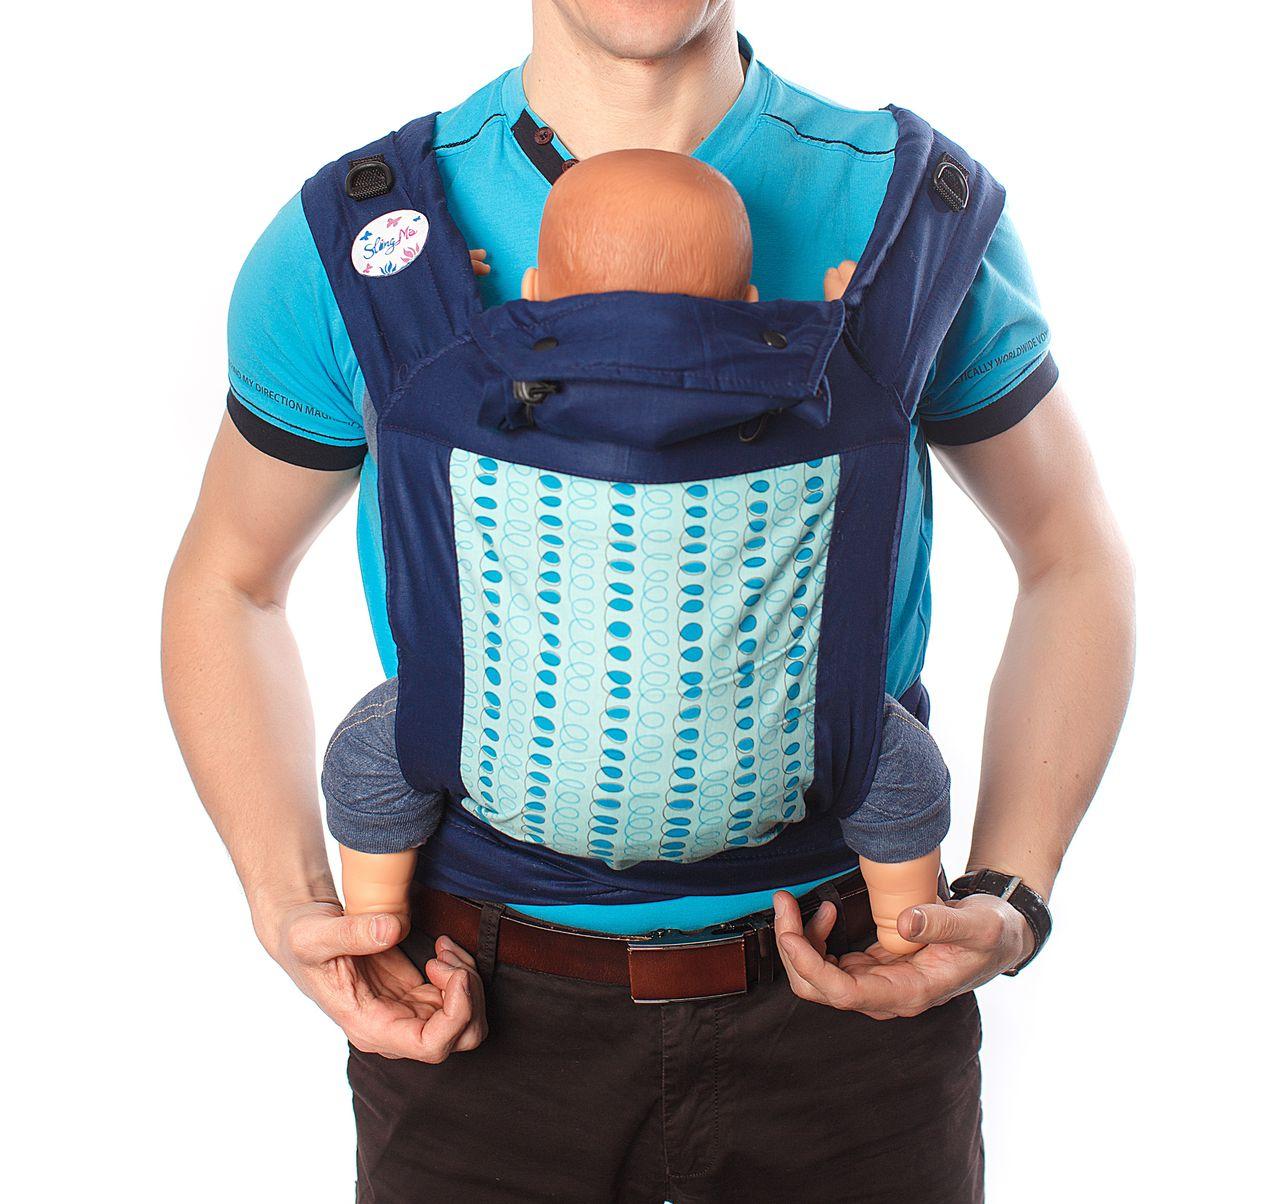 Купить Май-слинг, Май-слинг SlingMe Пружинки синий, Слинги для новорожденного